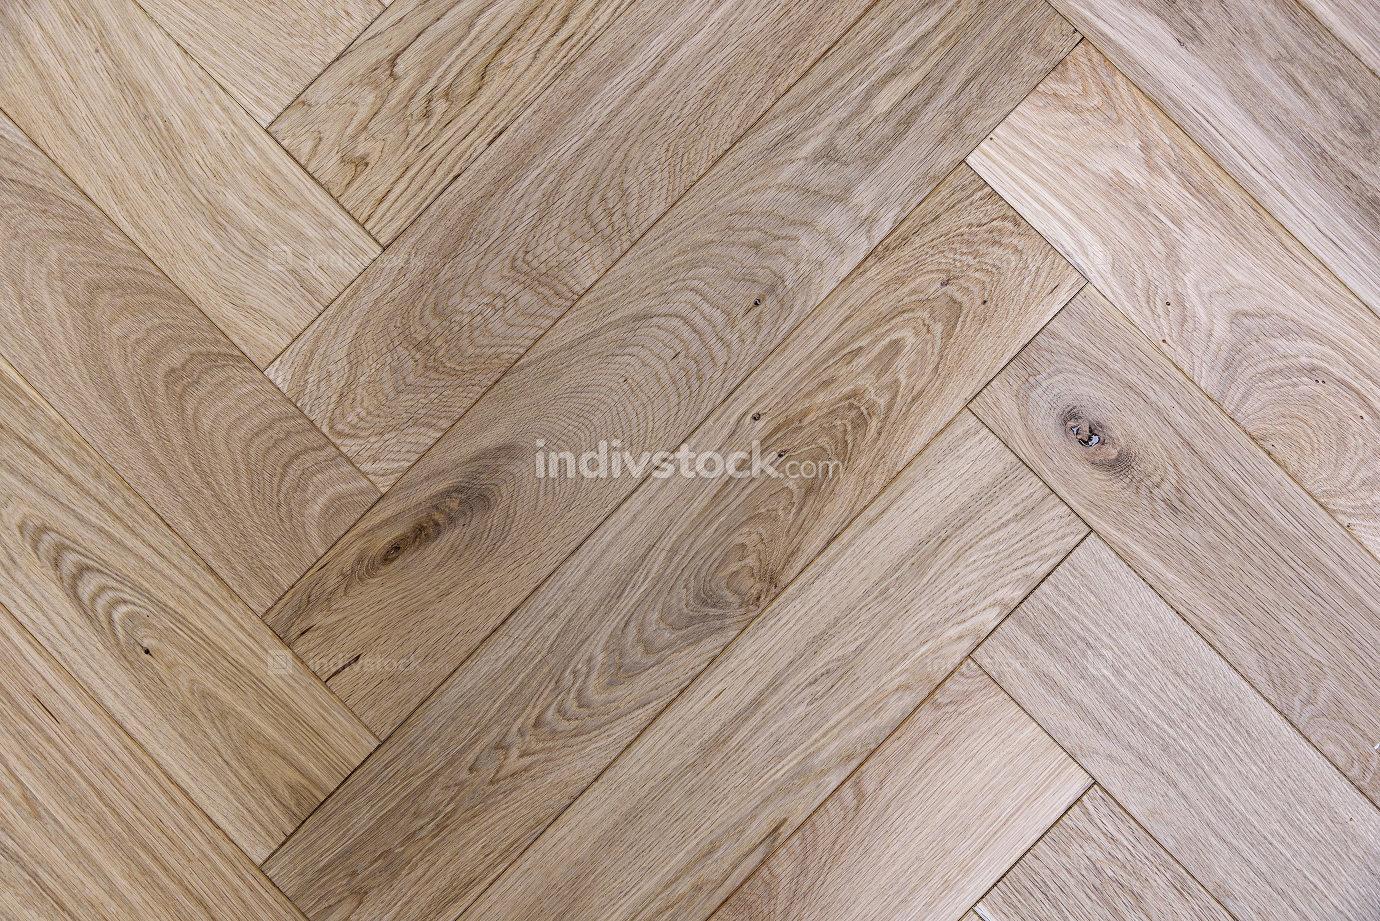 Texture of brown oak parquet